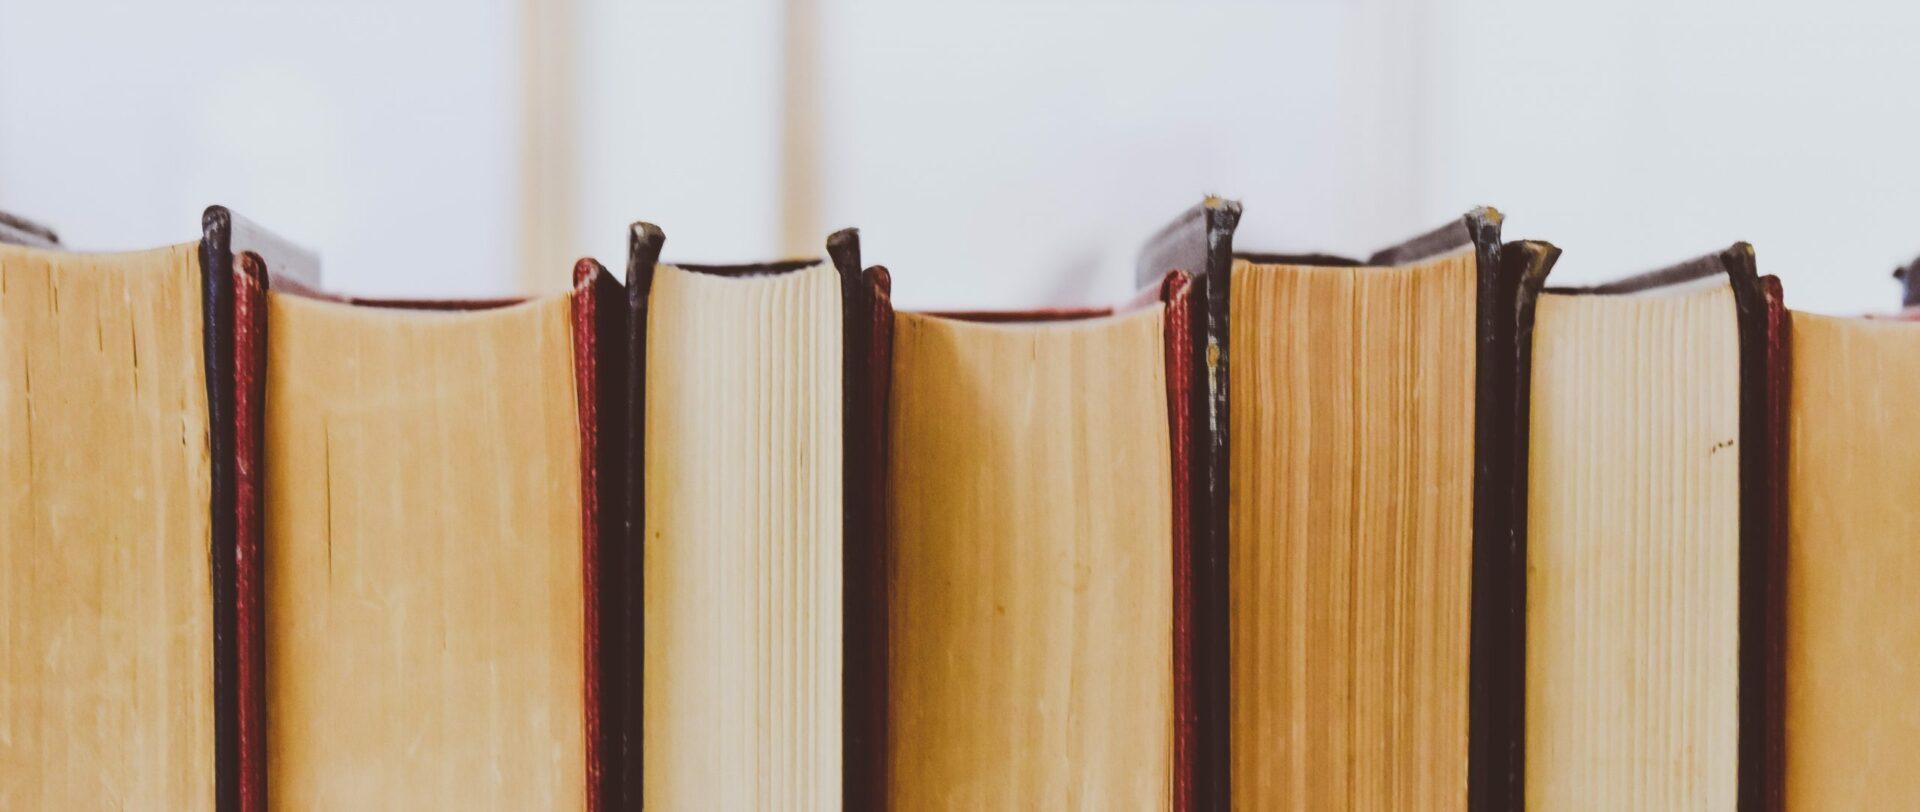 Mehrere geschlossene Bücher liegen dicht nebeneinander.